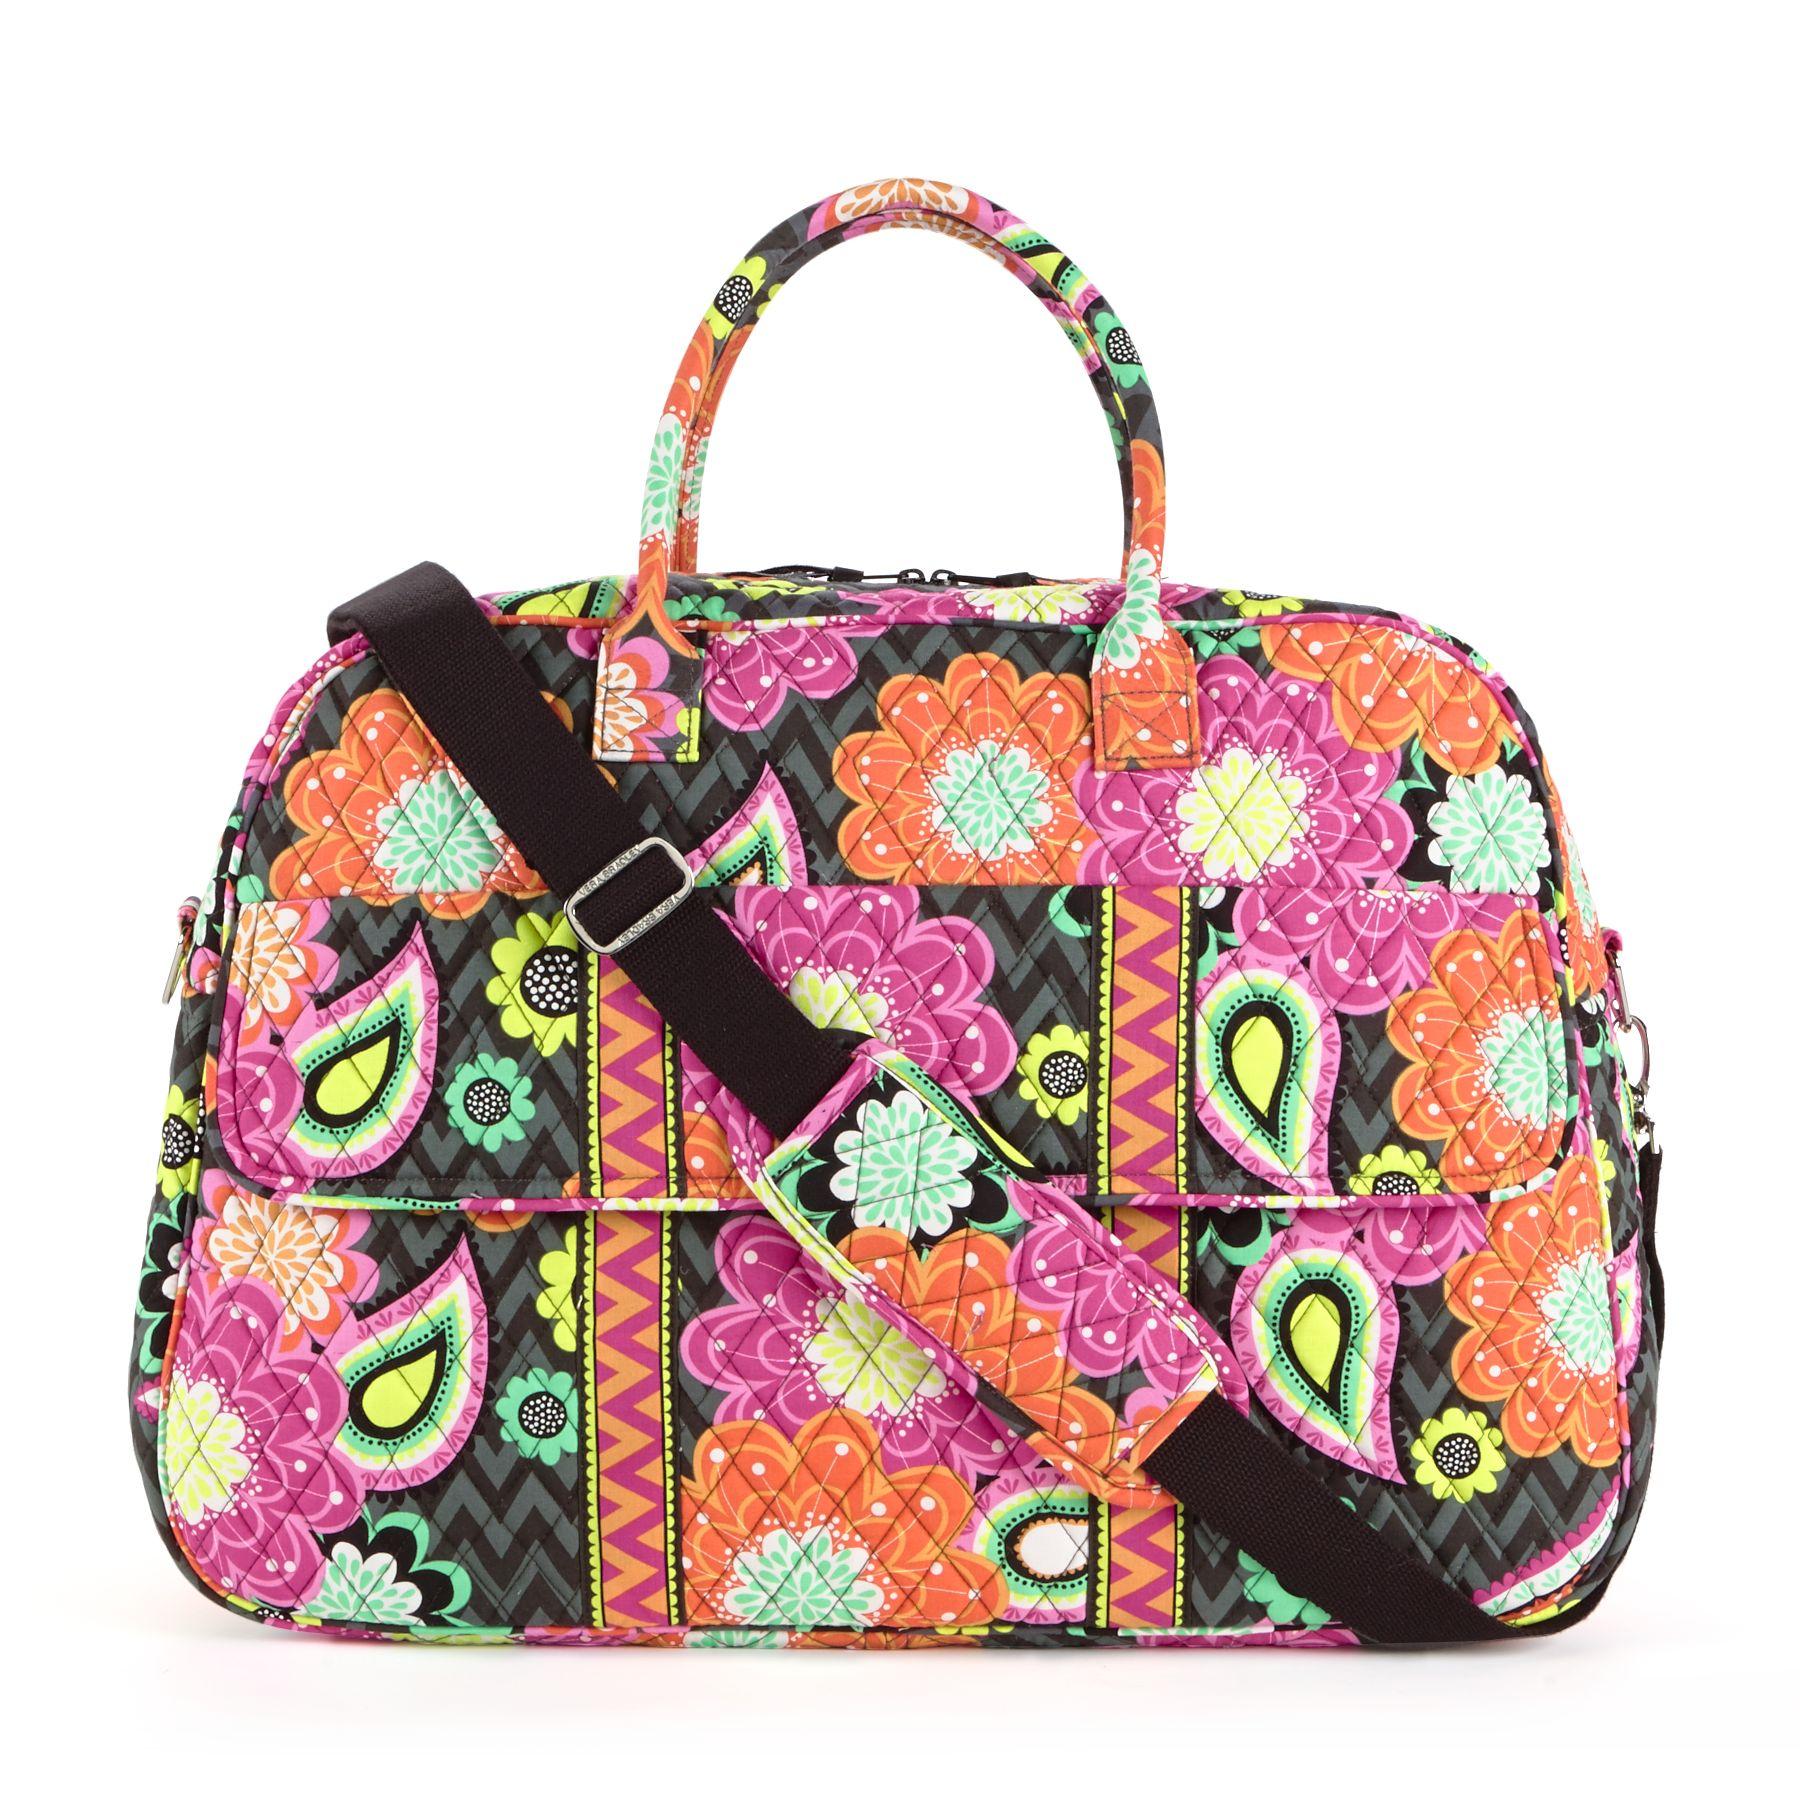 Vera Bradley Grand Traveler Bag in Ziggy Zinnia